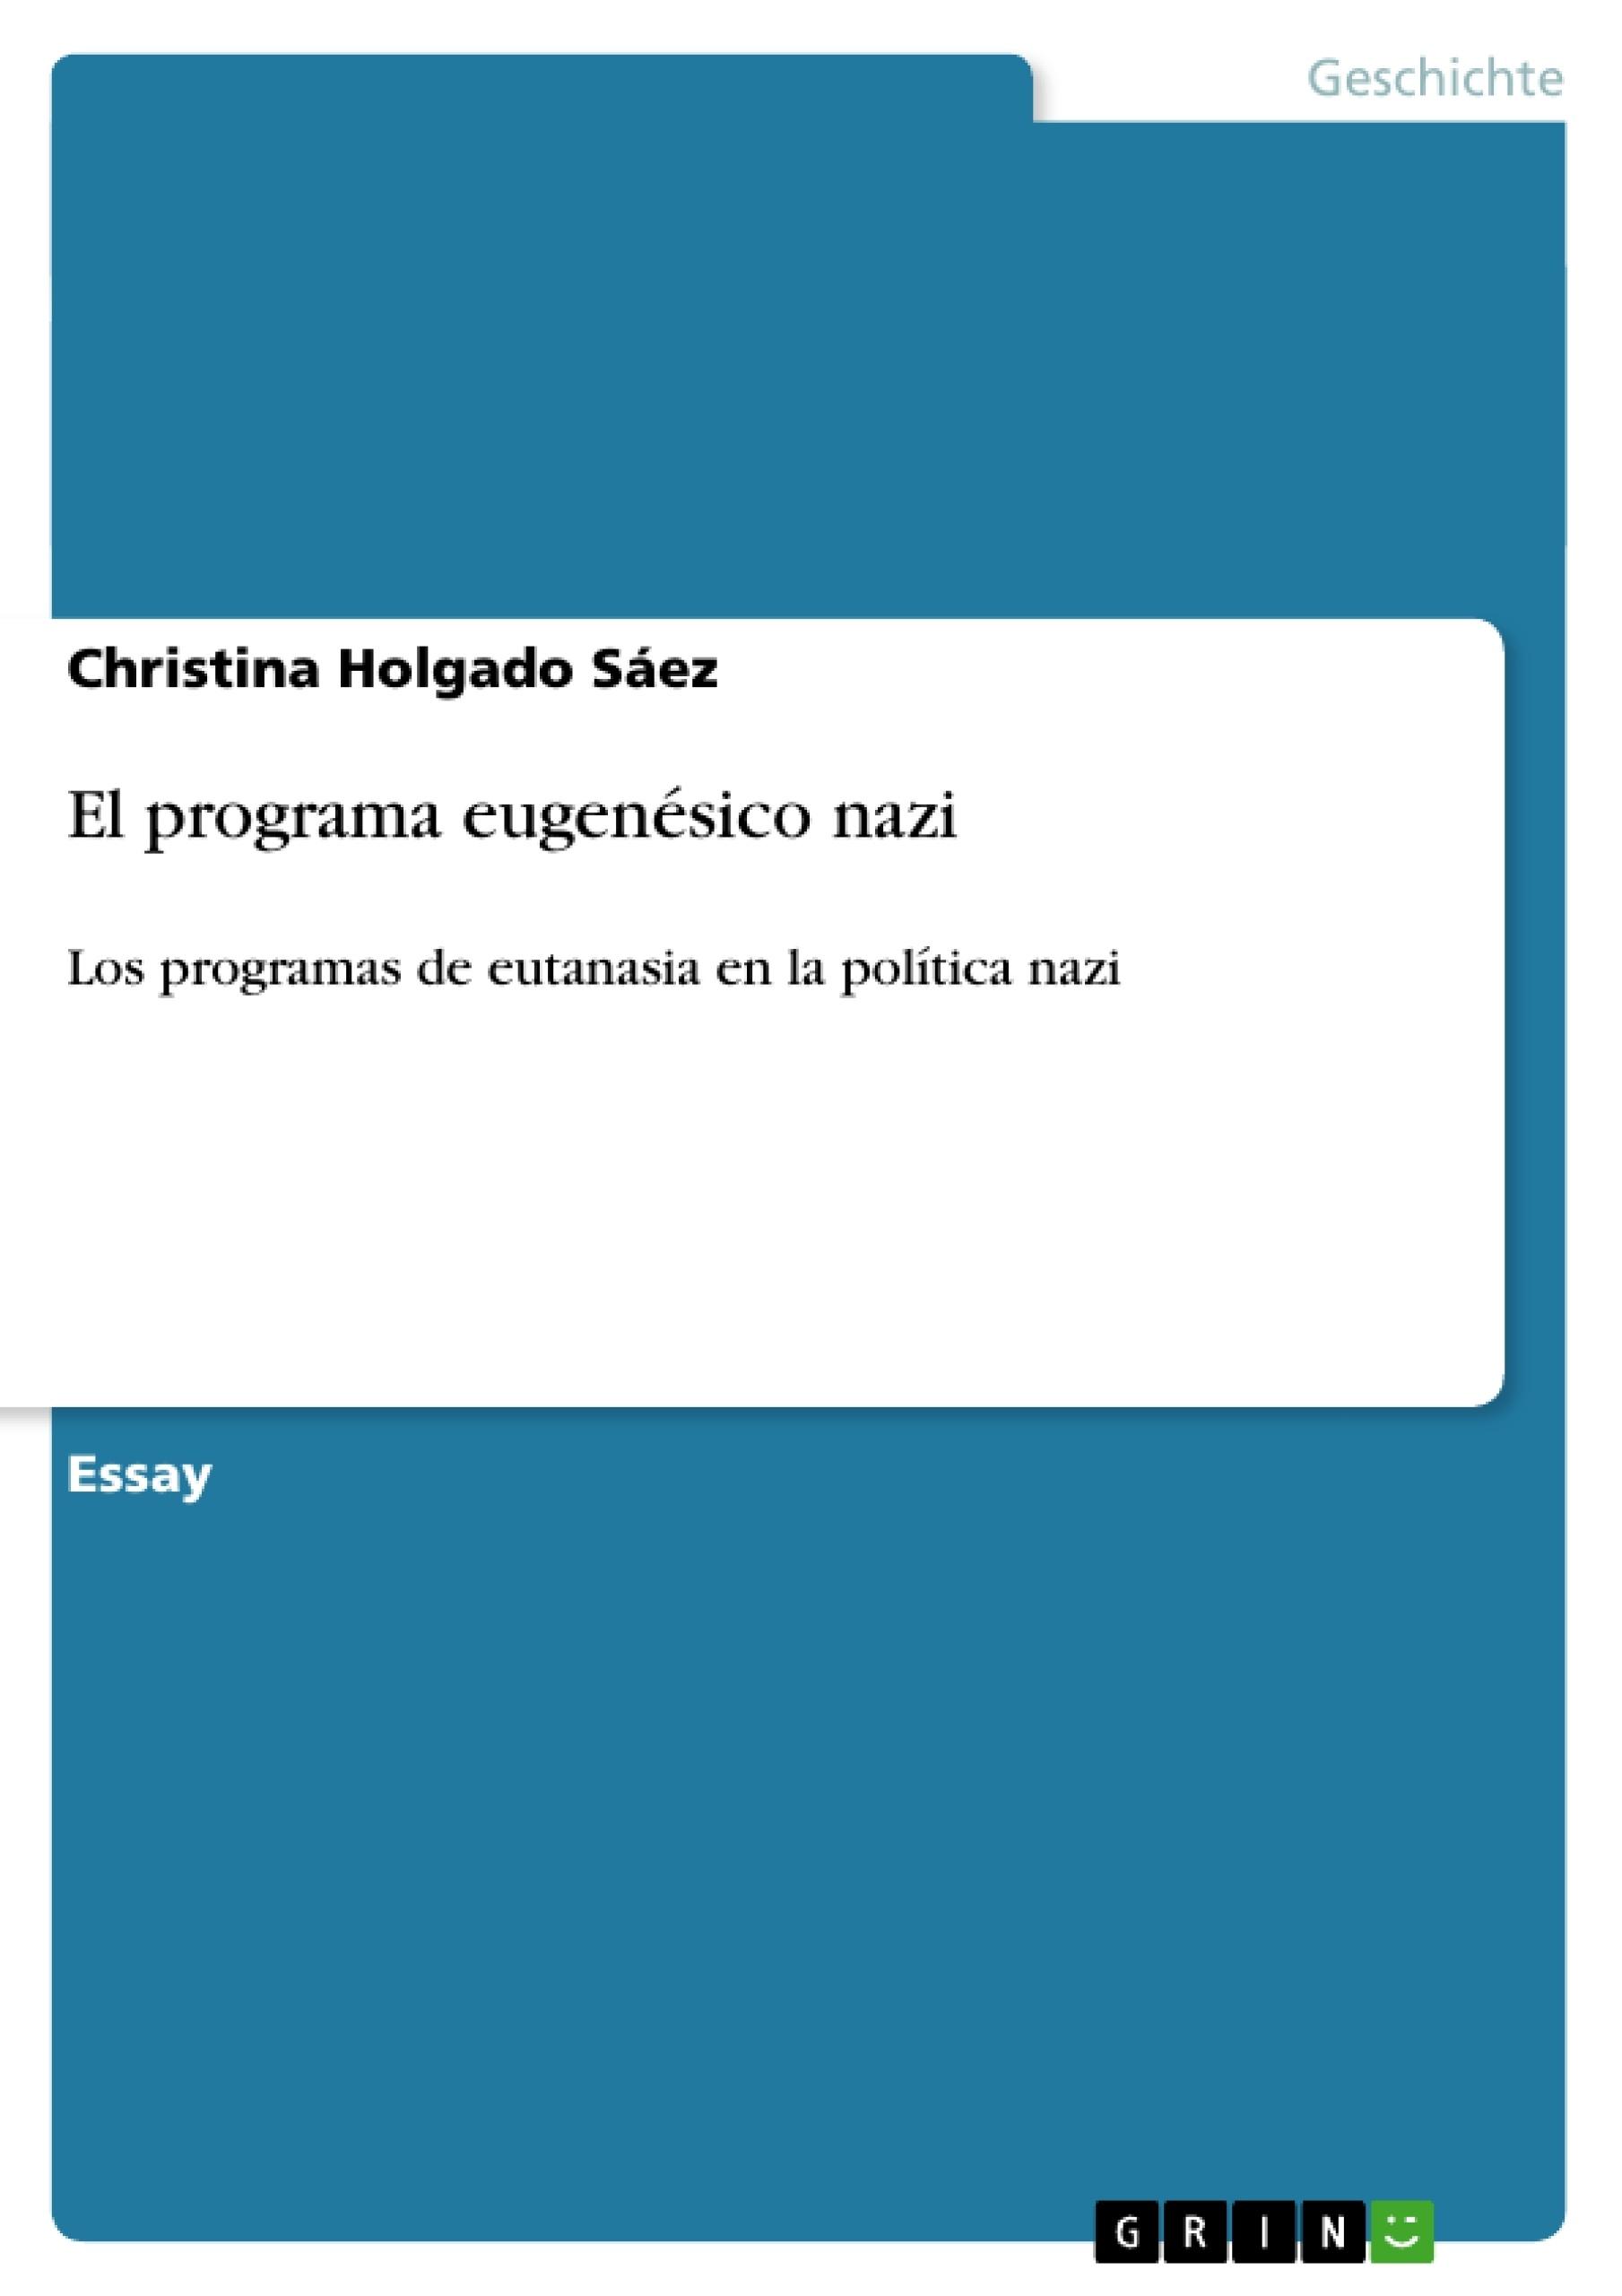 Titel: El programa eugenésico nazi